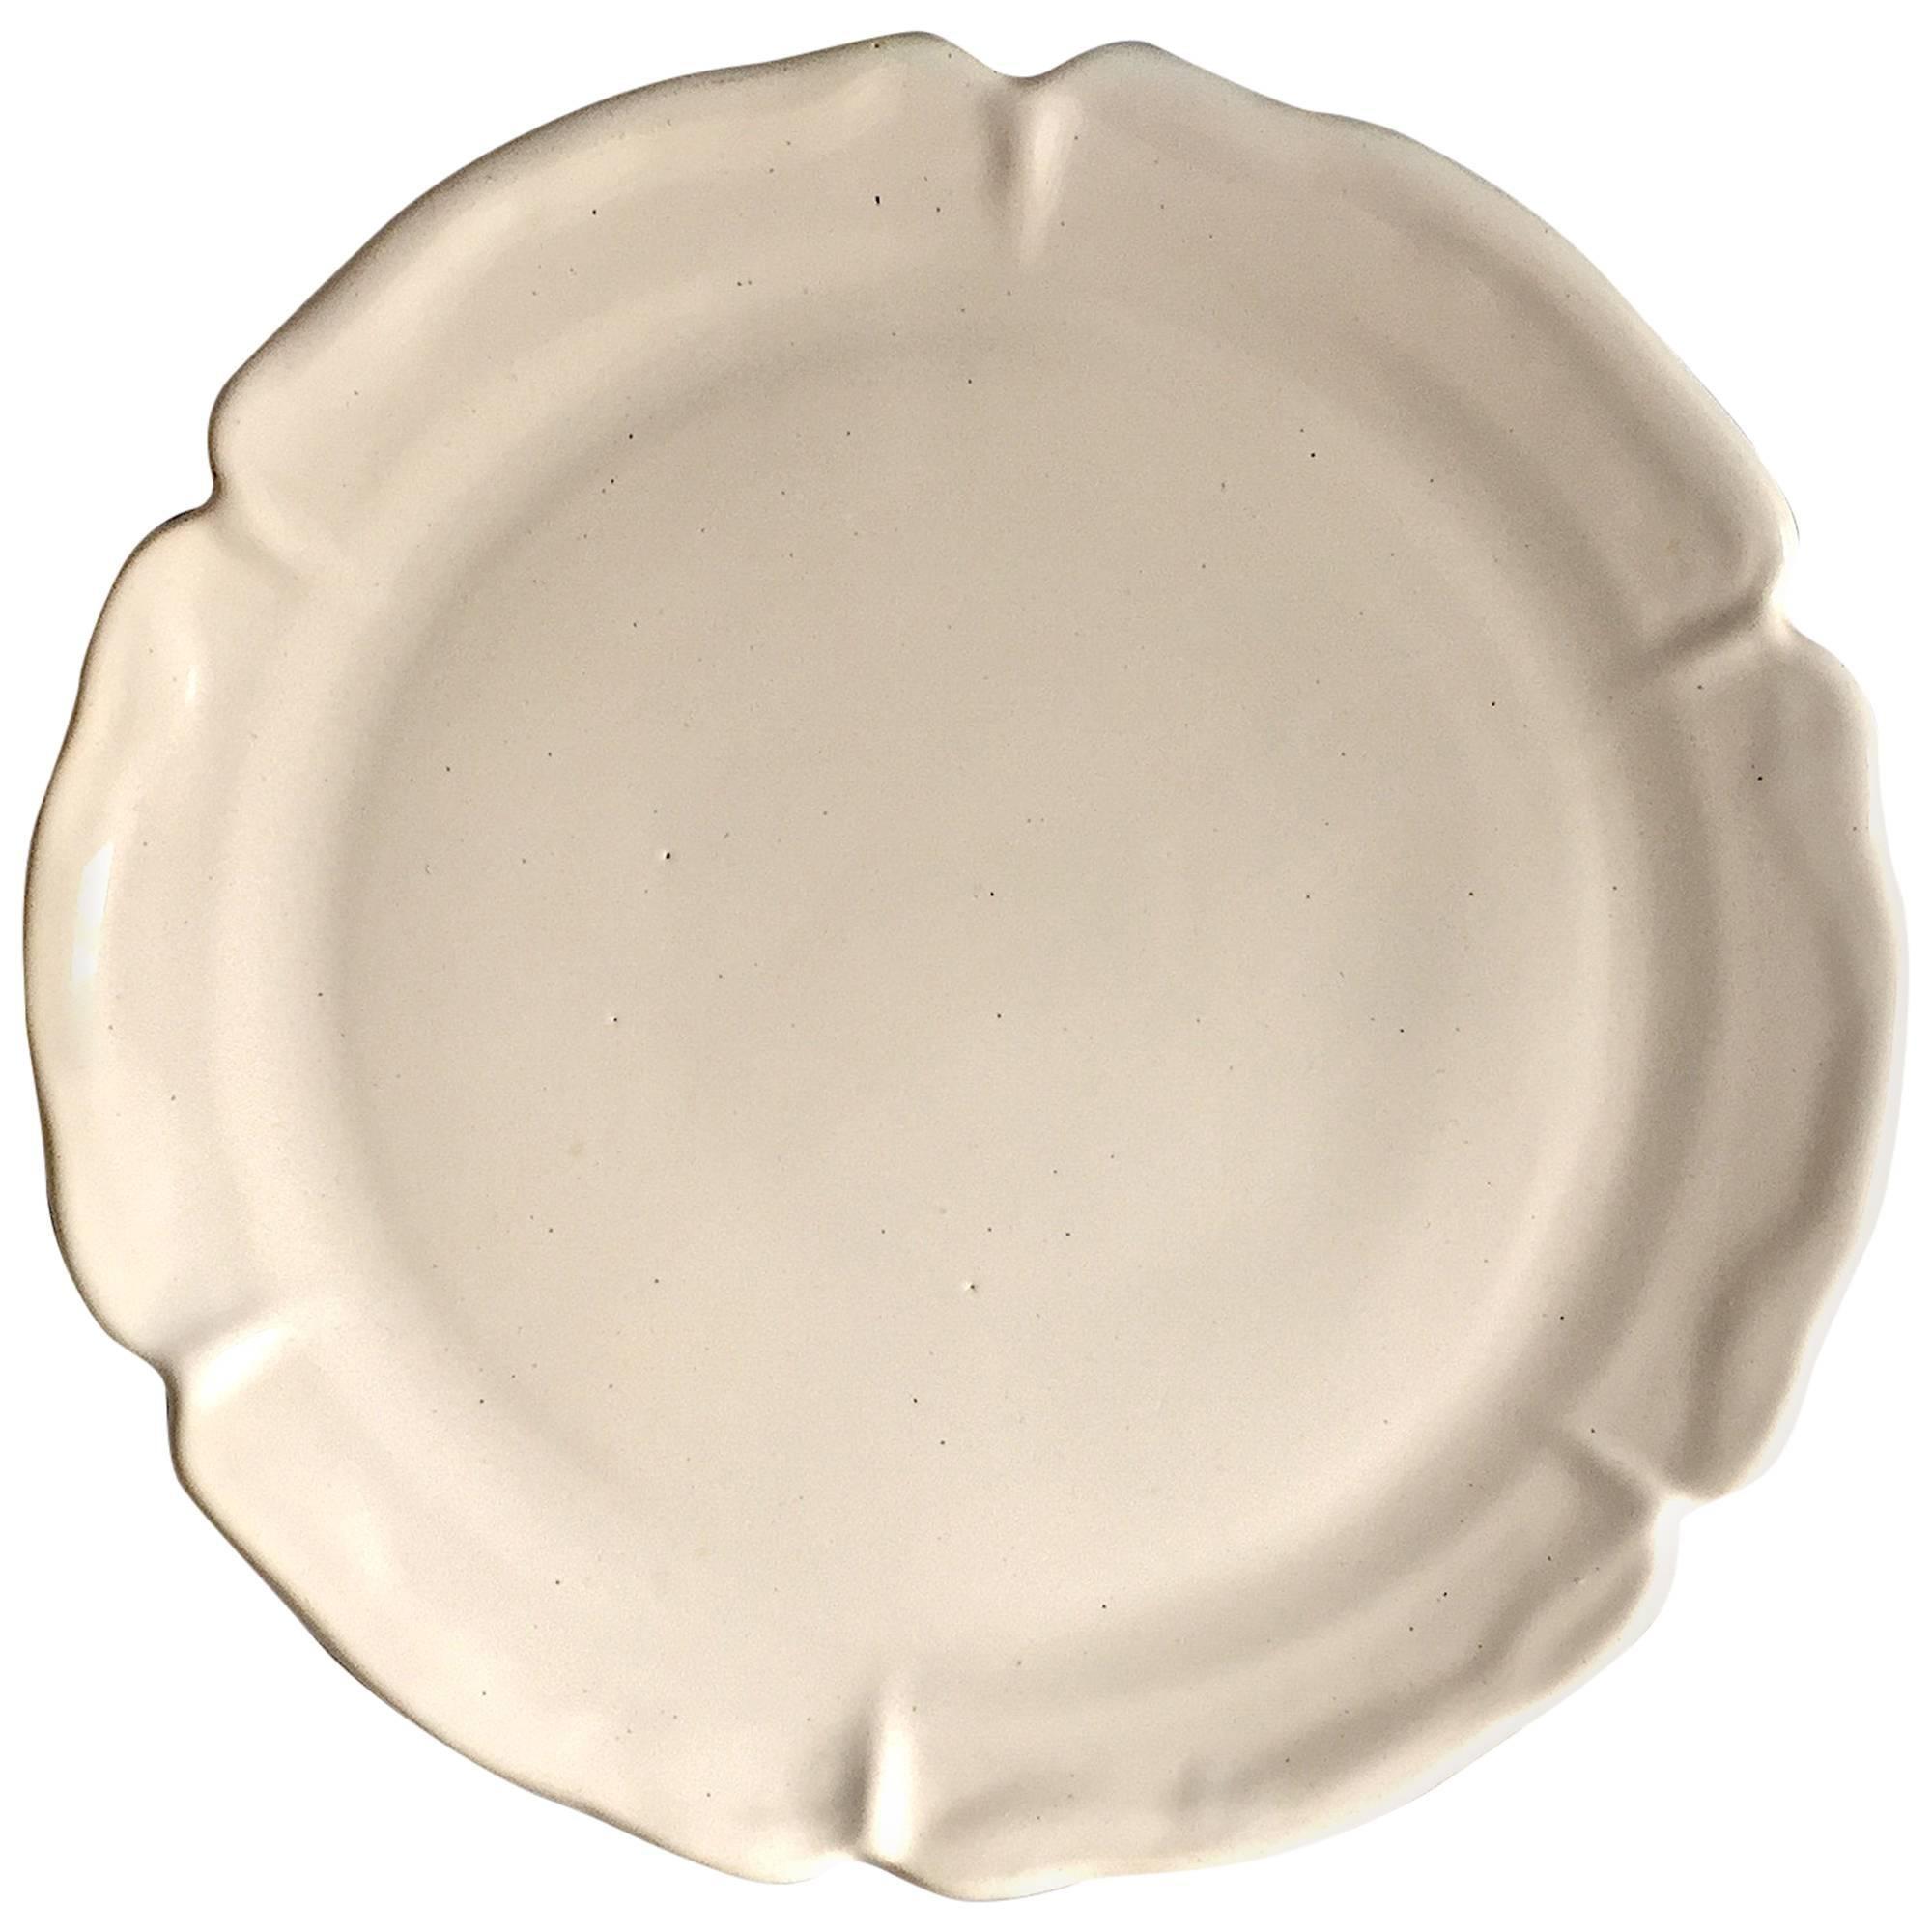 Suzanne Ramie, Madoura, Large White Plate